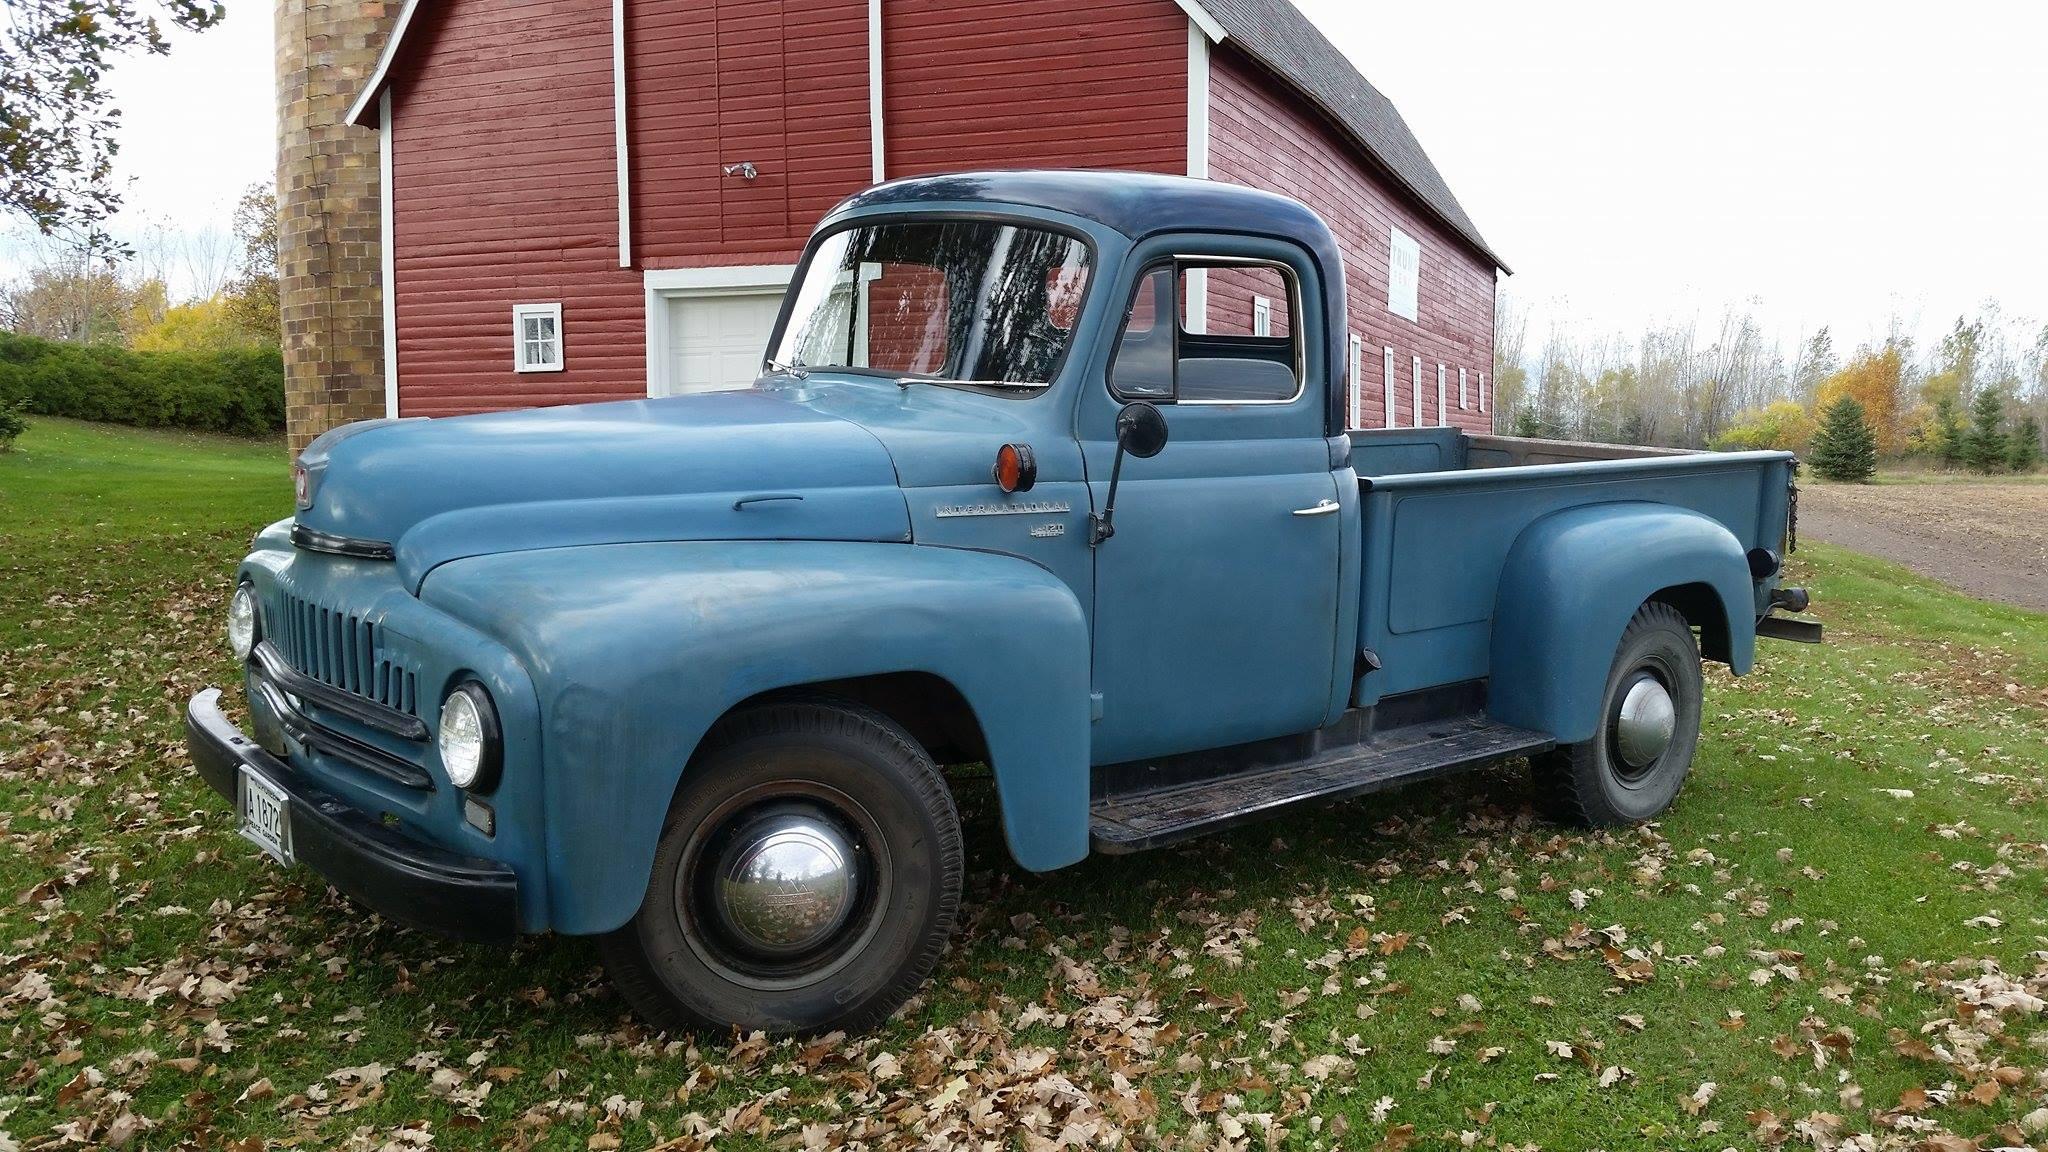 Backyard Classics | Classic Cars | Thief River Falls MN